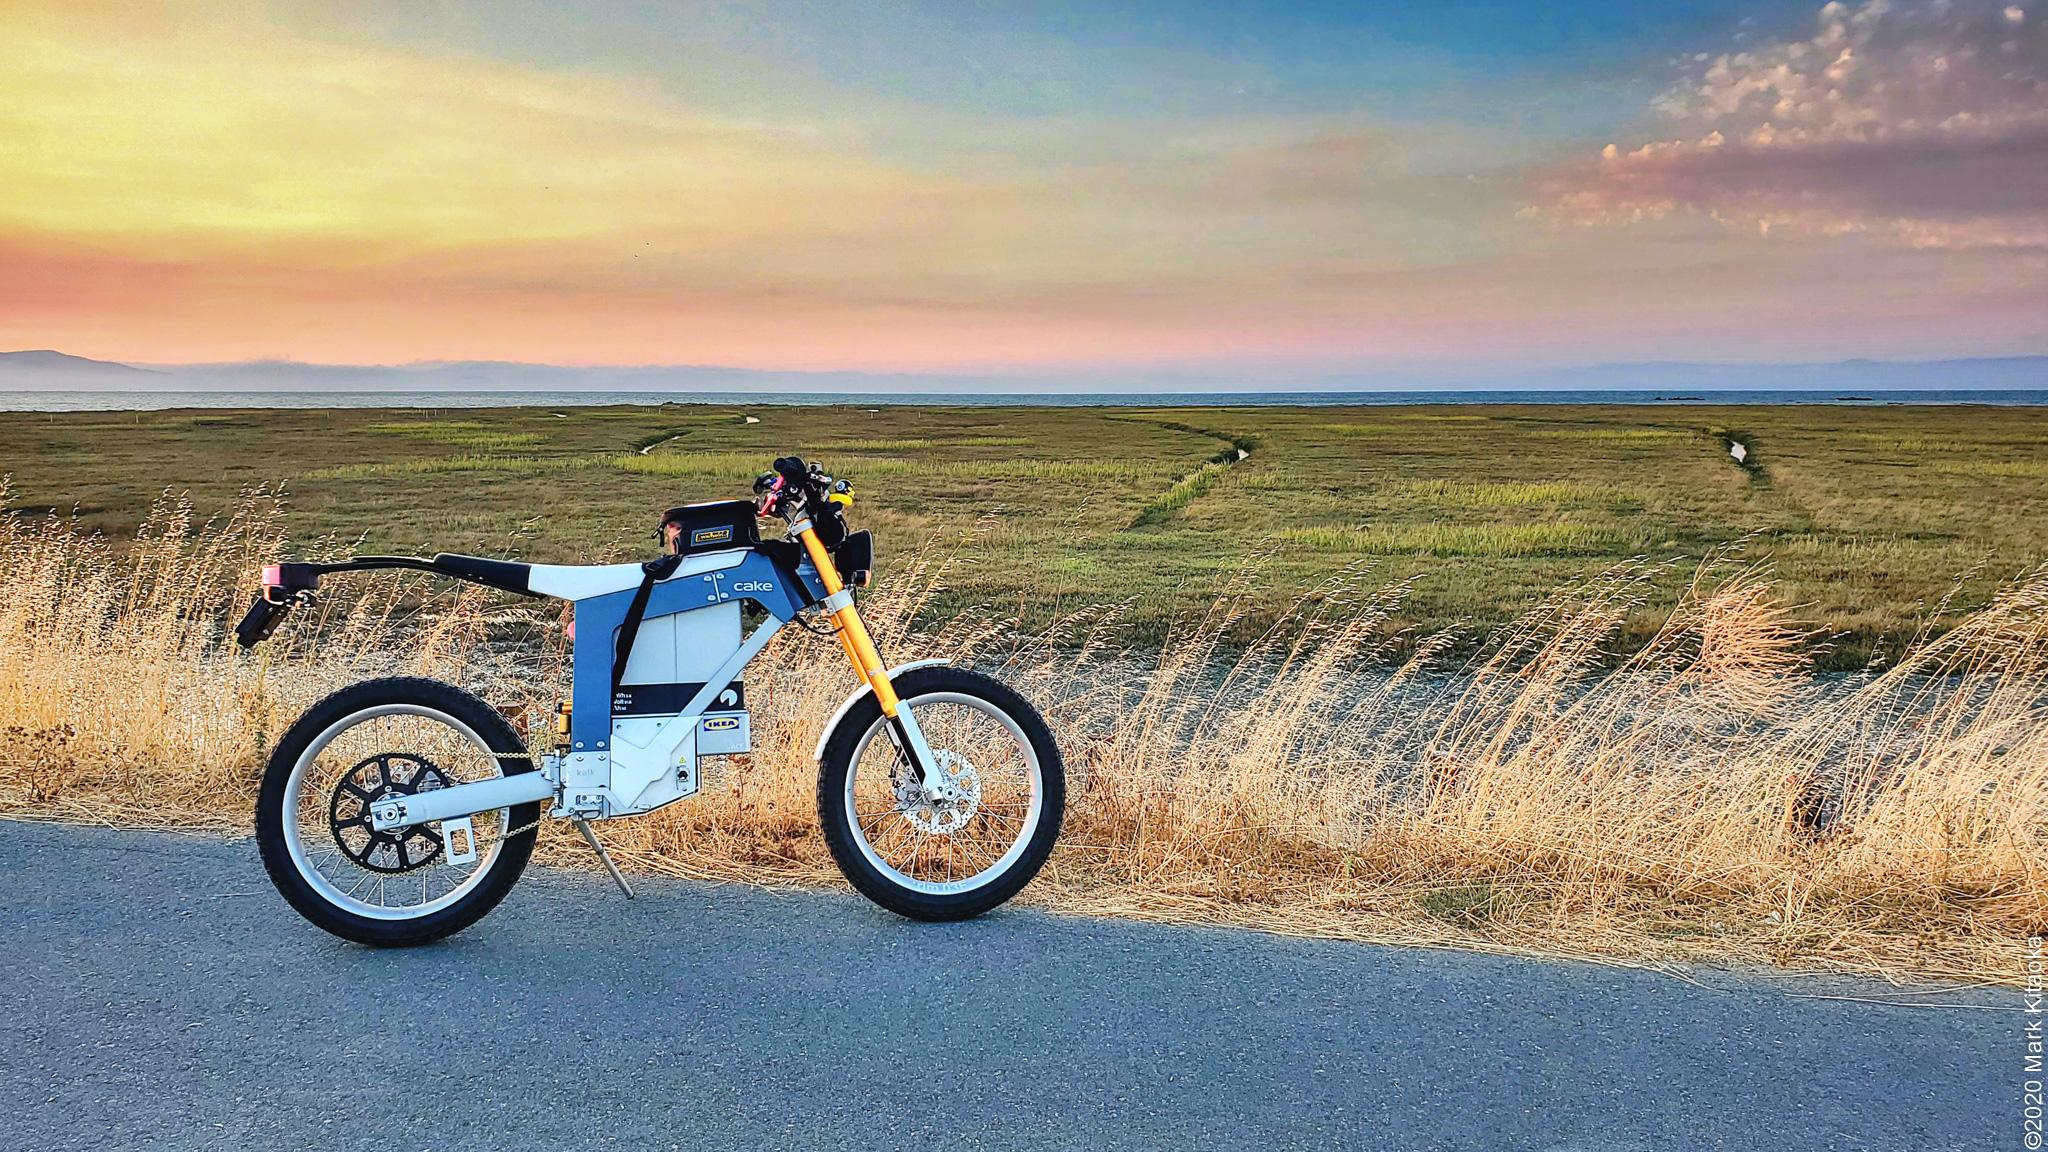 Kalk& bike next to grass field